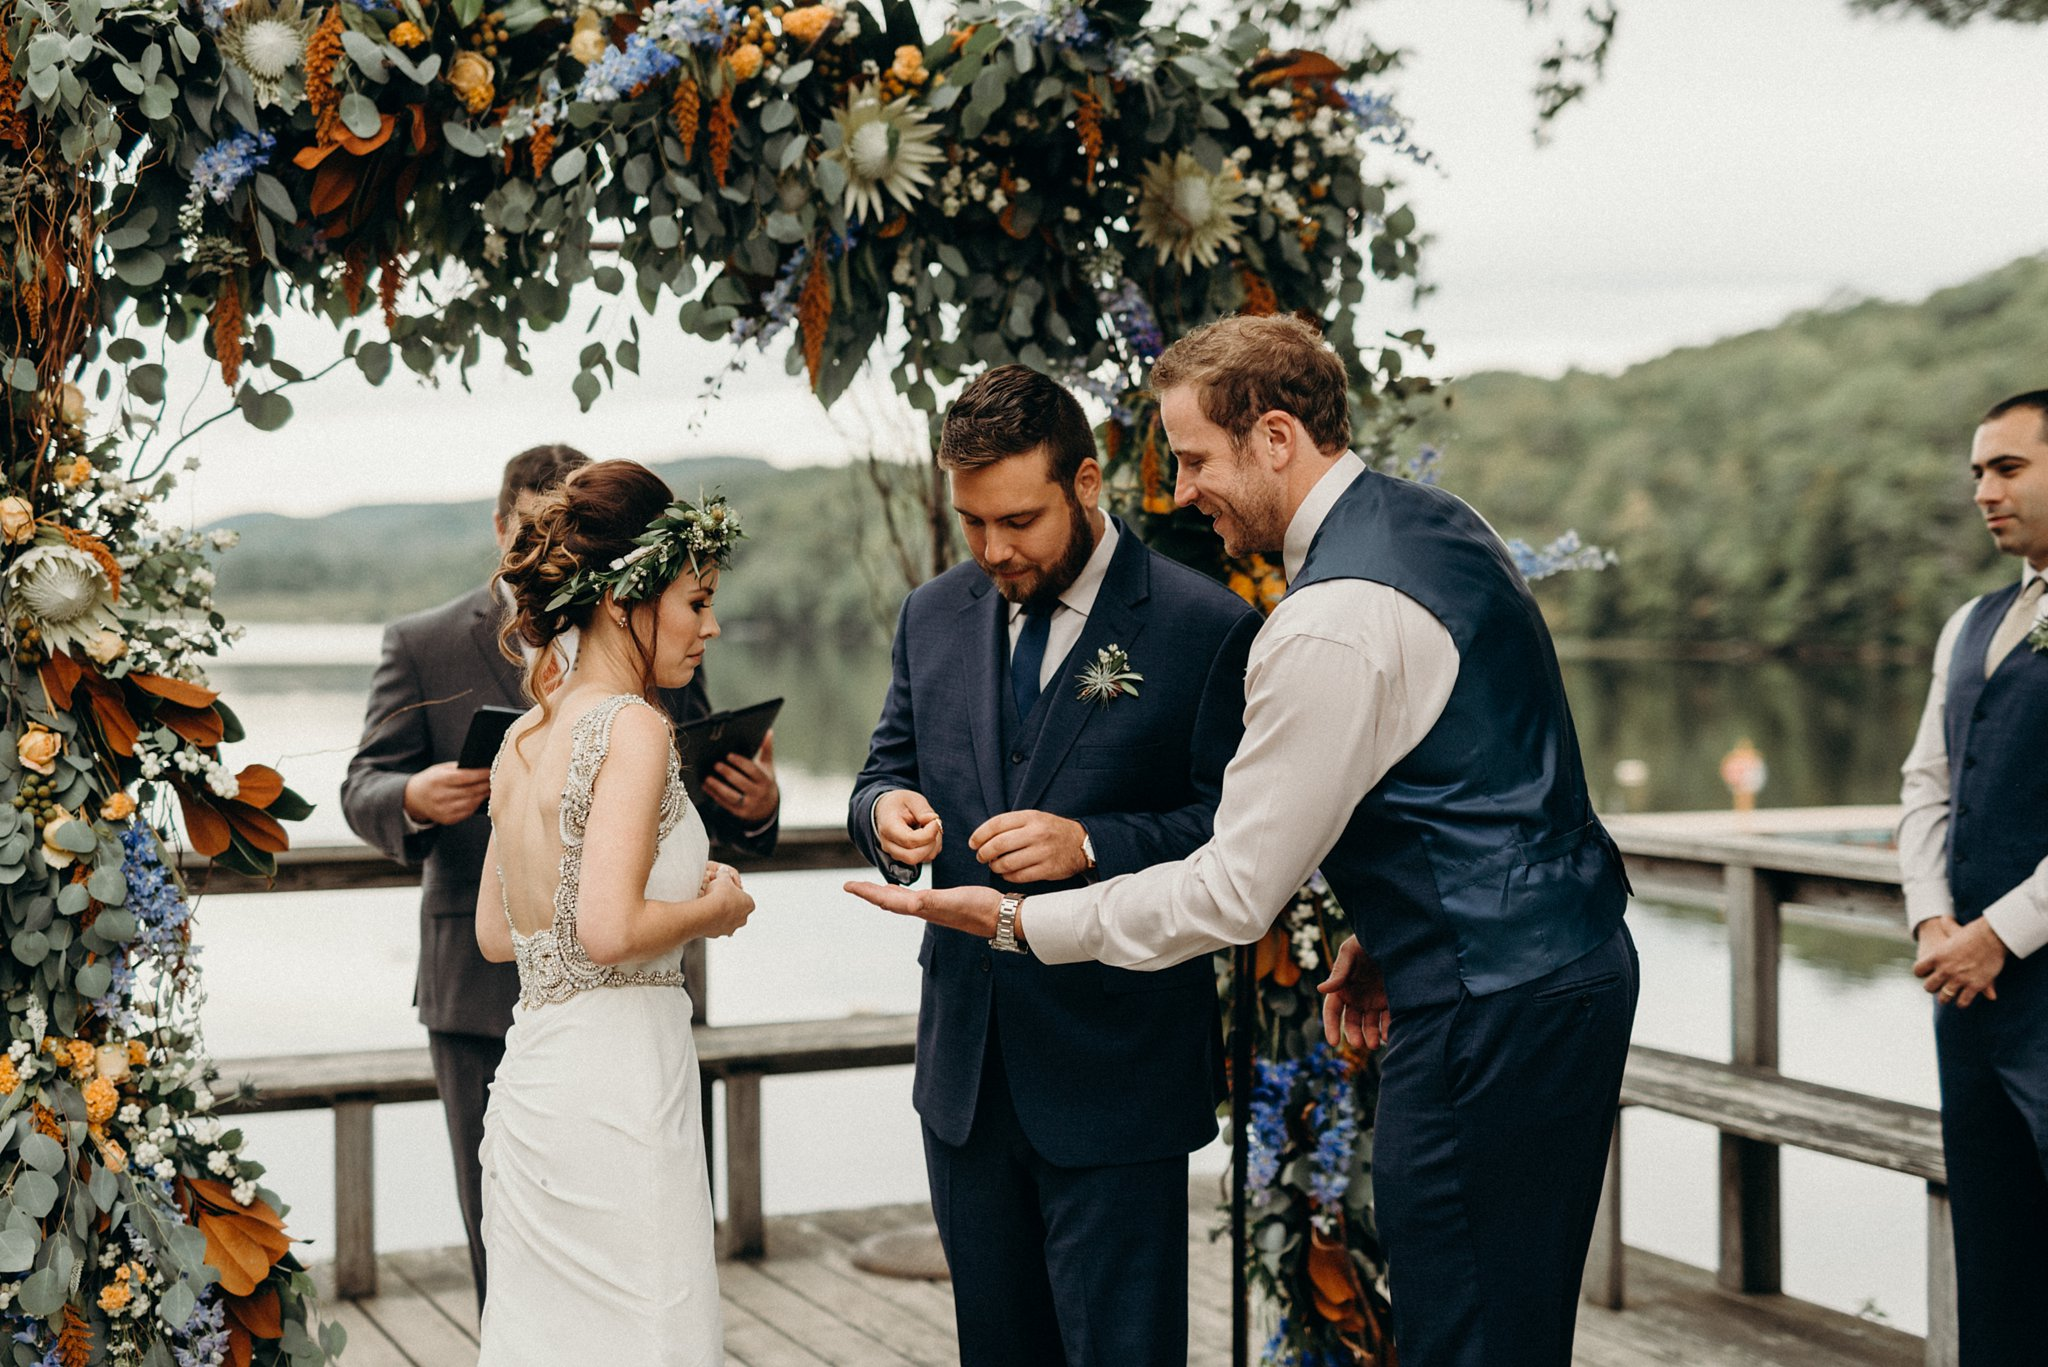 kaihla_tonai_intimate_wedding_elopement_photographer_6637.jpg